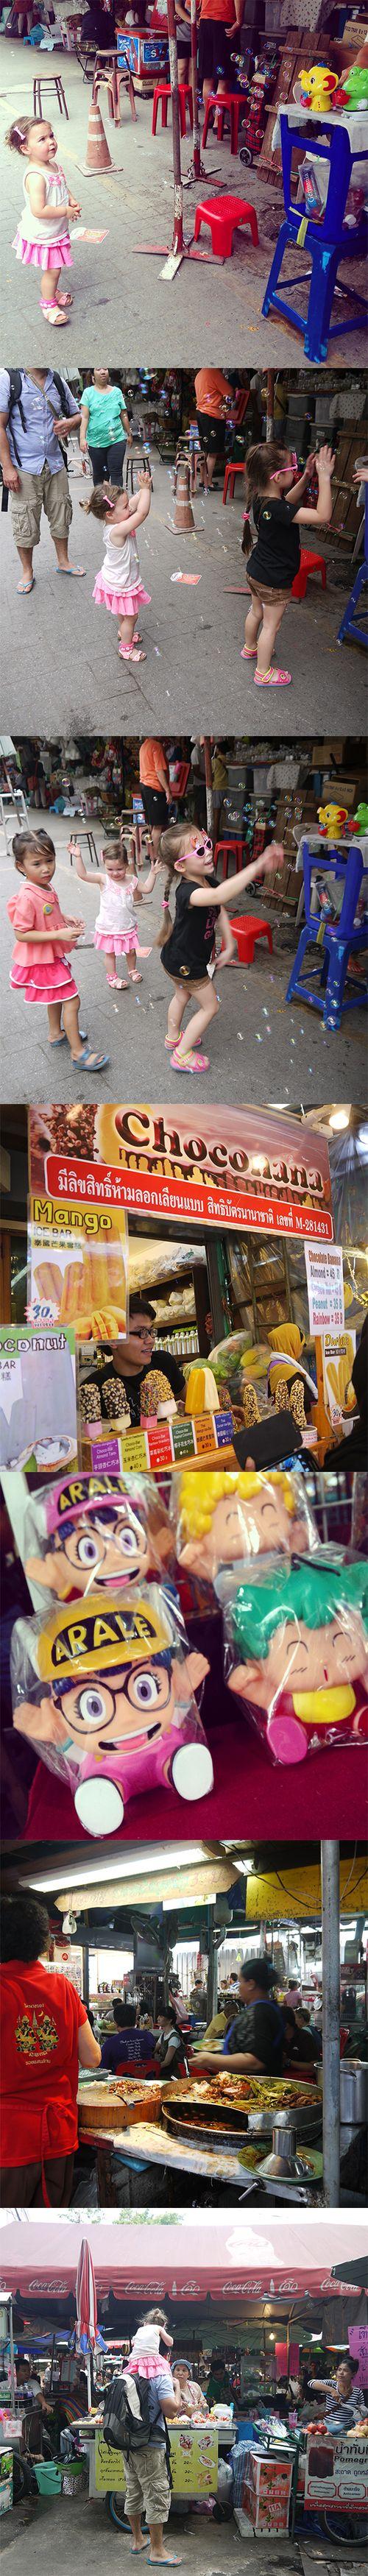 Bangkok-voyage-famille-pimpandpomme-thailande-16